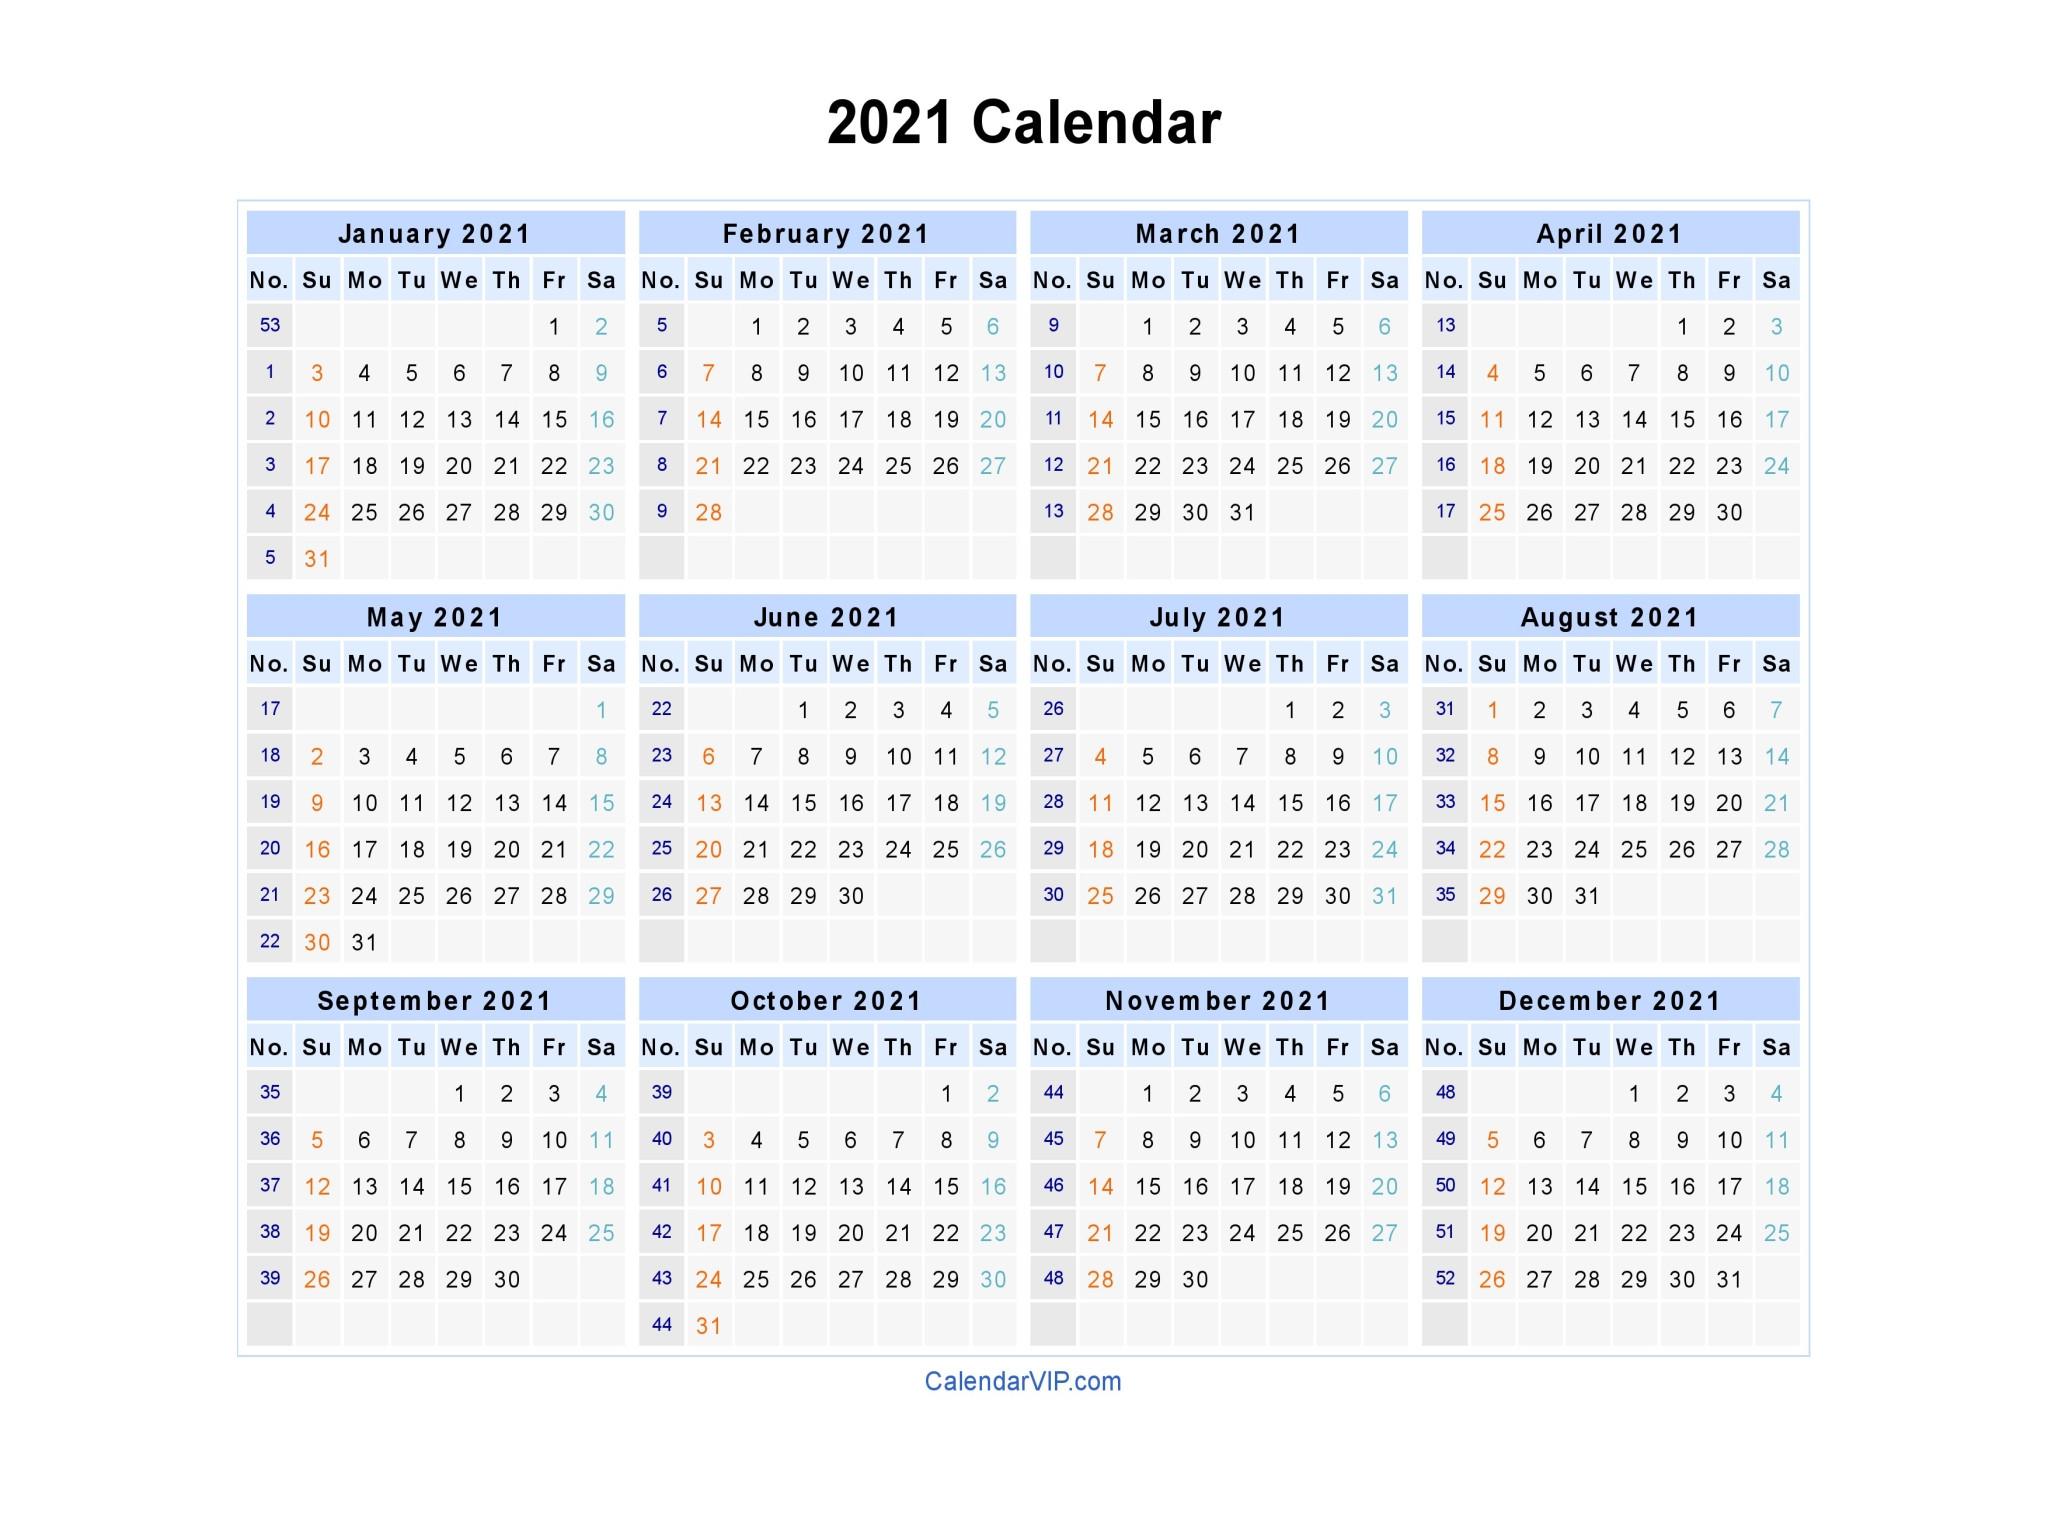 2021 Calendar Printable-Printable Month To Month Calendar 2021